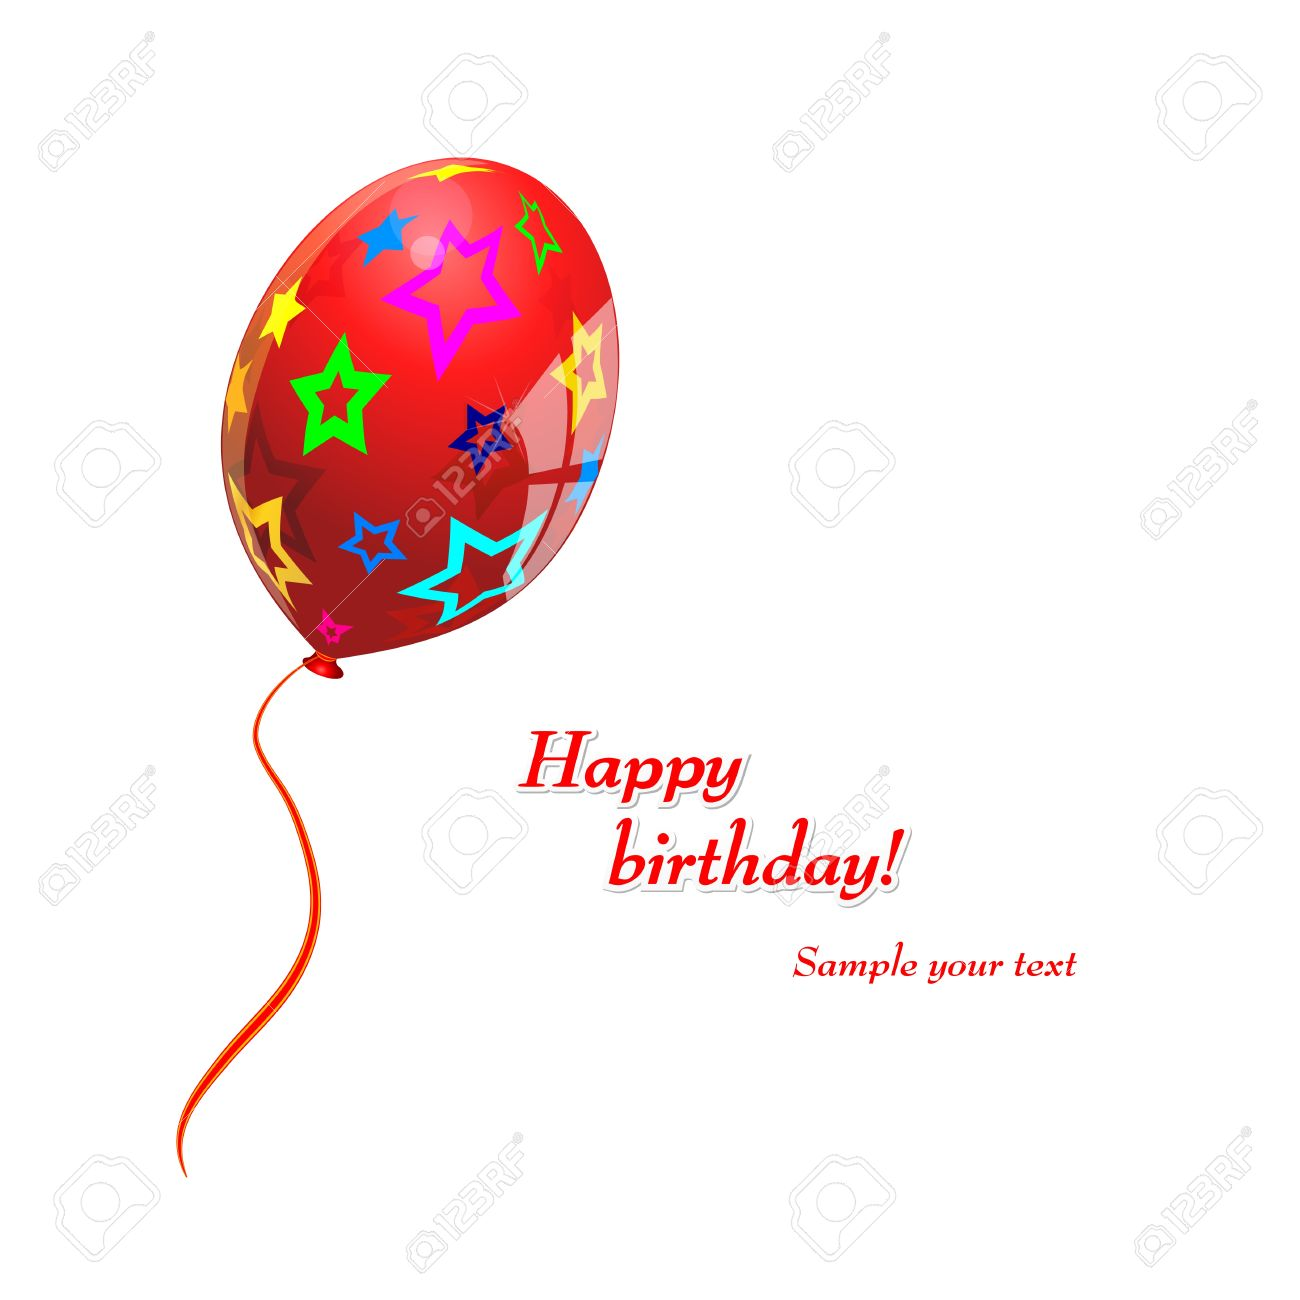 Birthday Single Red Balloon Vector Royalty Free Cliparts Vectors